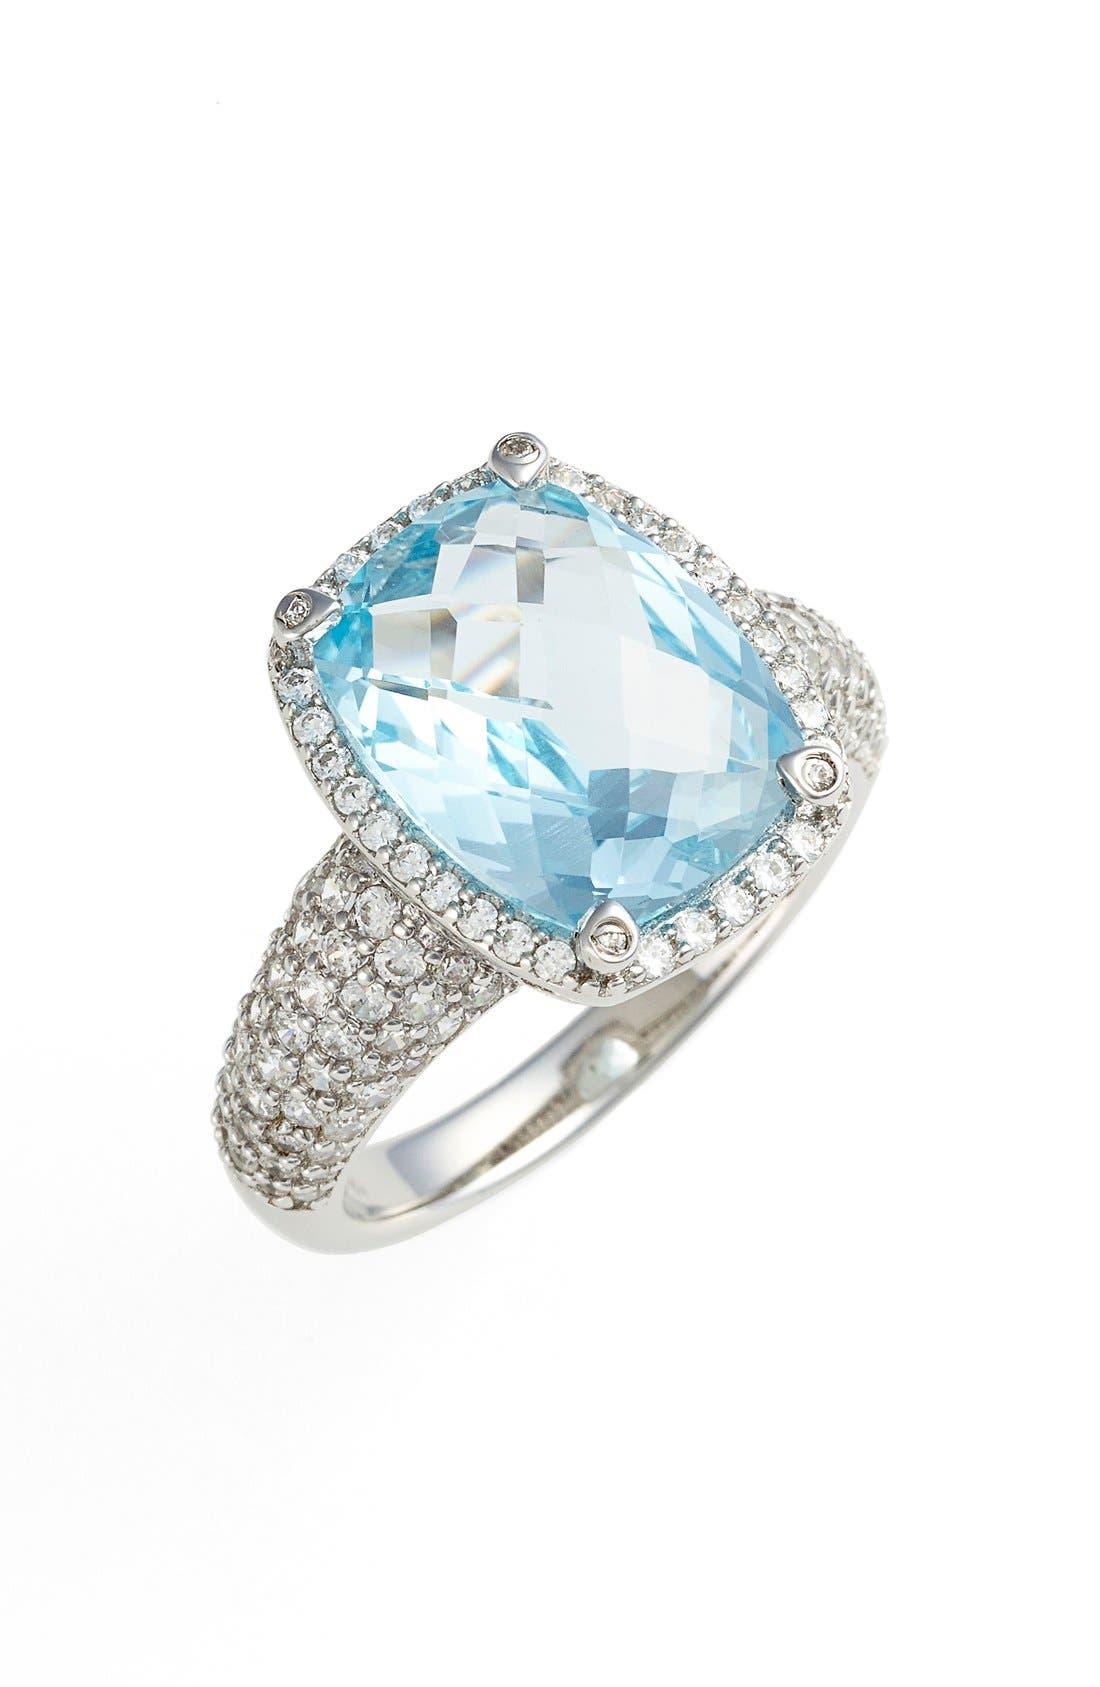 Alternate Image 1 Selected - Lafonn'Aria' Rectangle Cushion Cut Ring